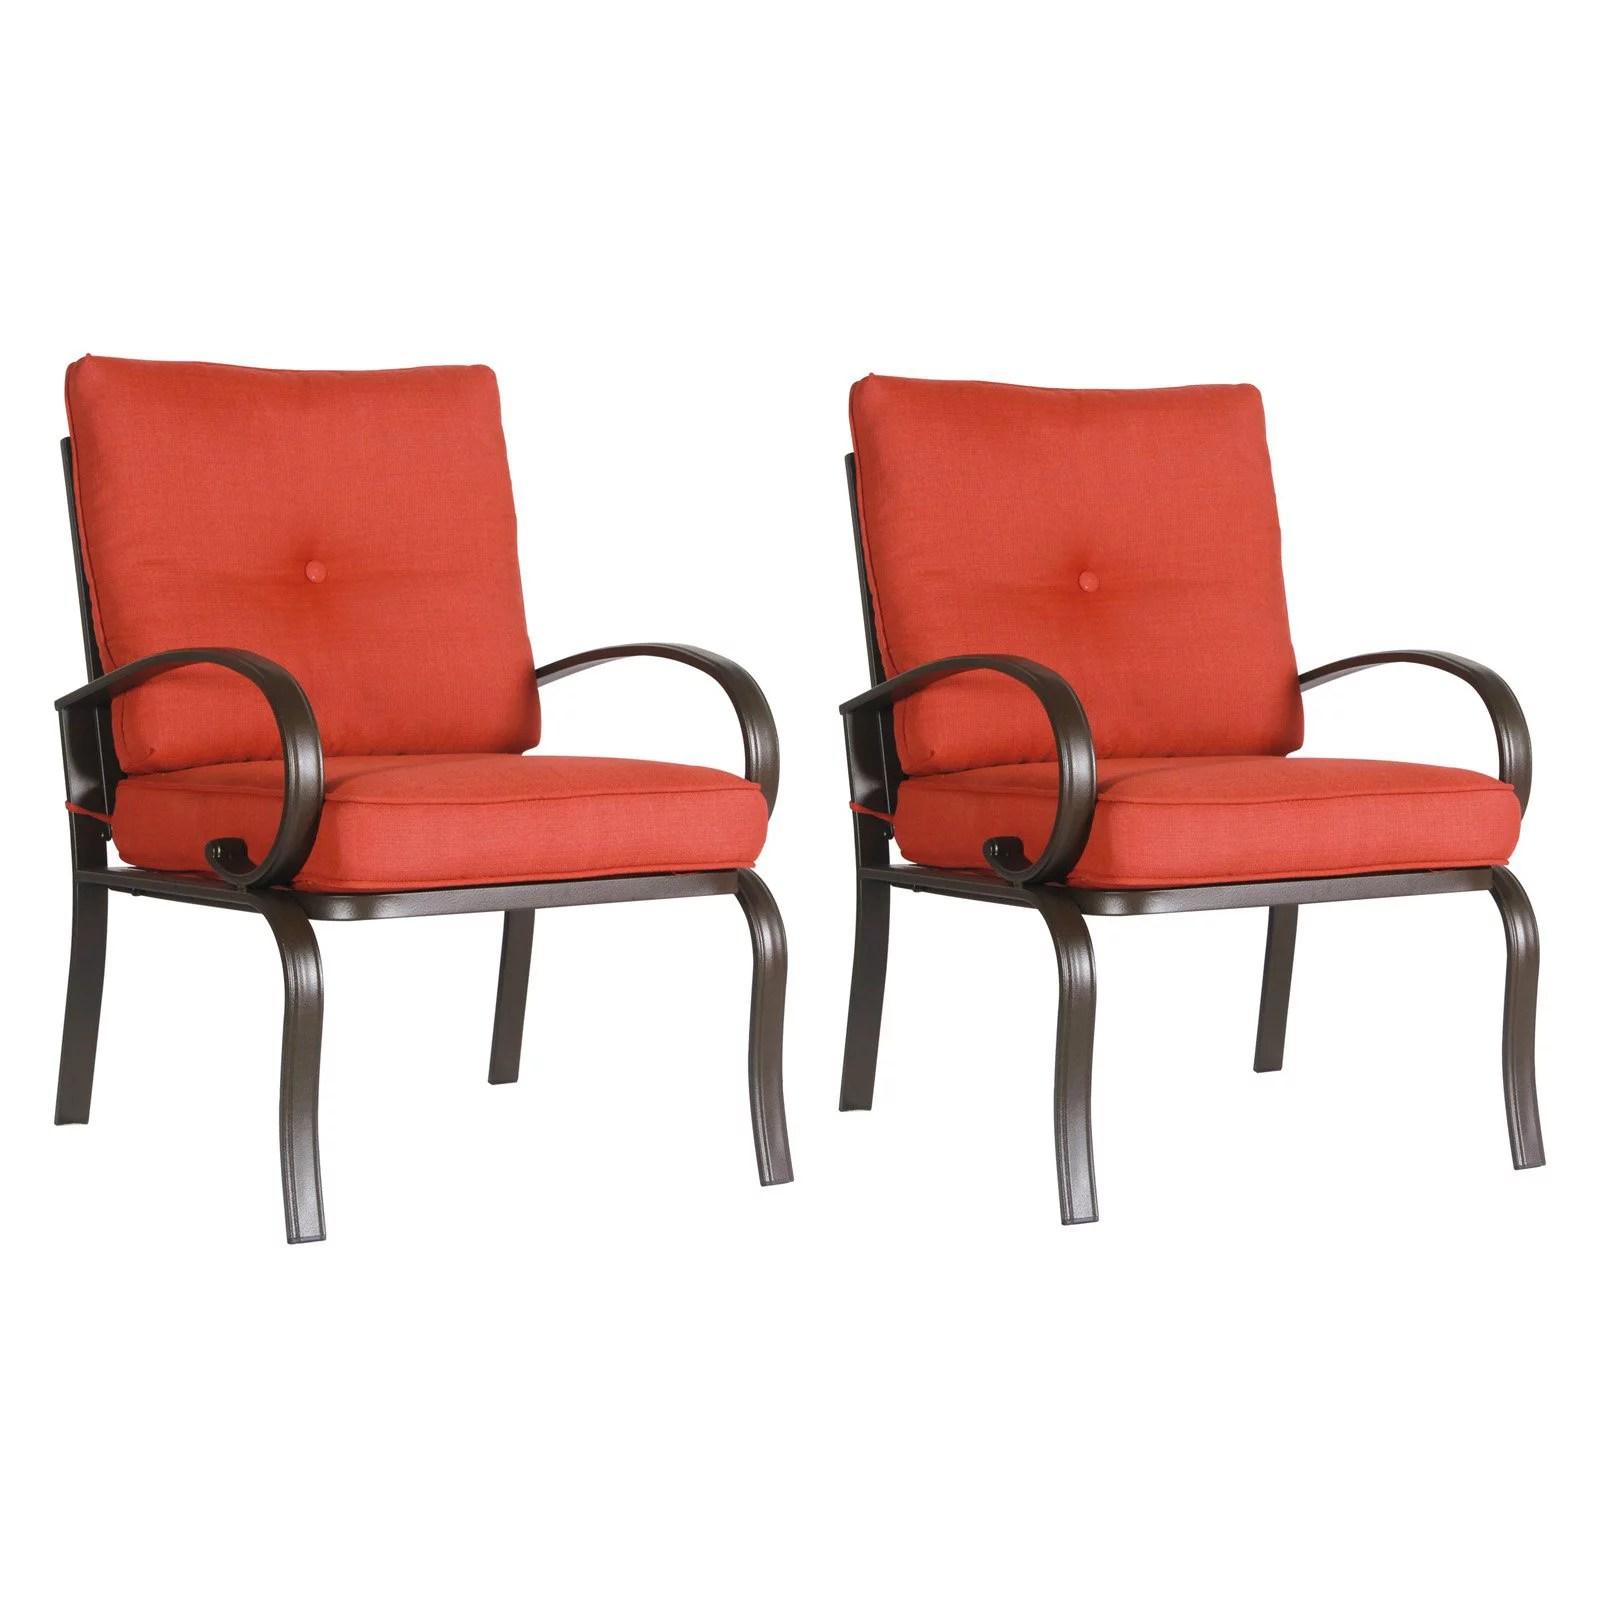 patio club chair diy adirondack chairs plans cloud mountain wrought iron dining set of 2 walmart com